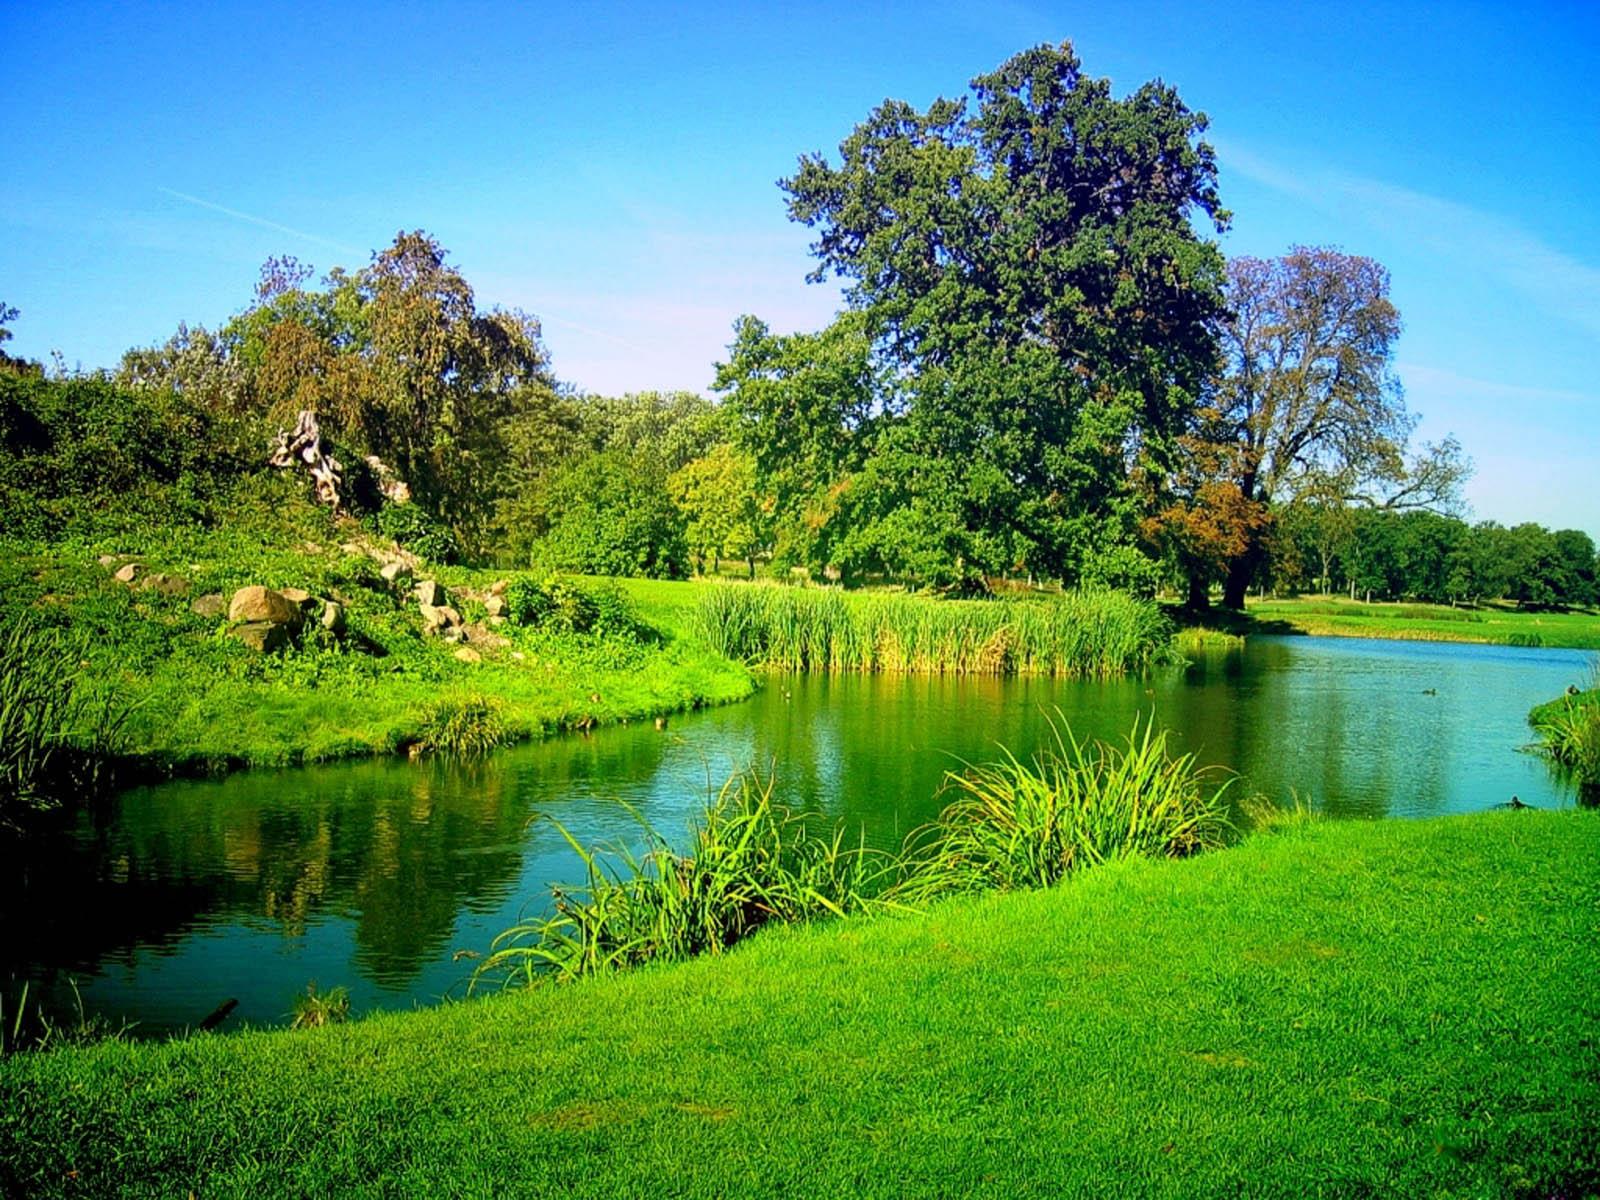 beautiful nature wallpapers - alees blog